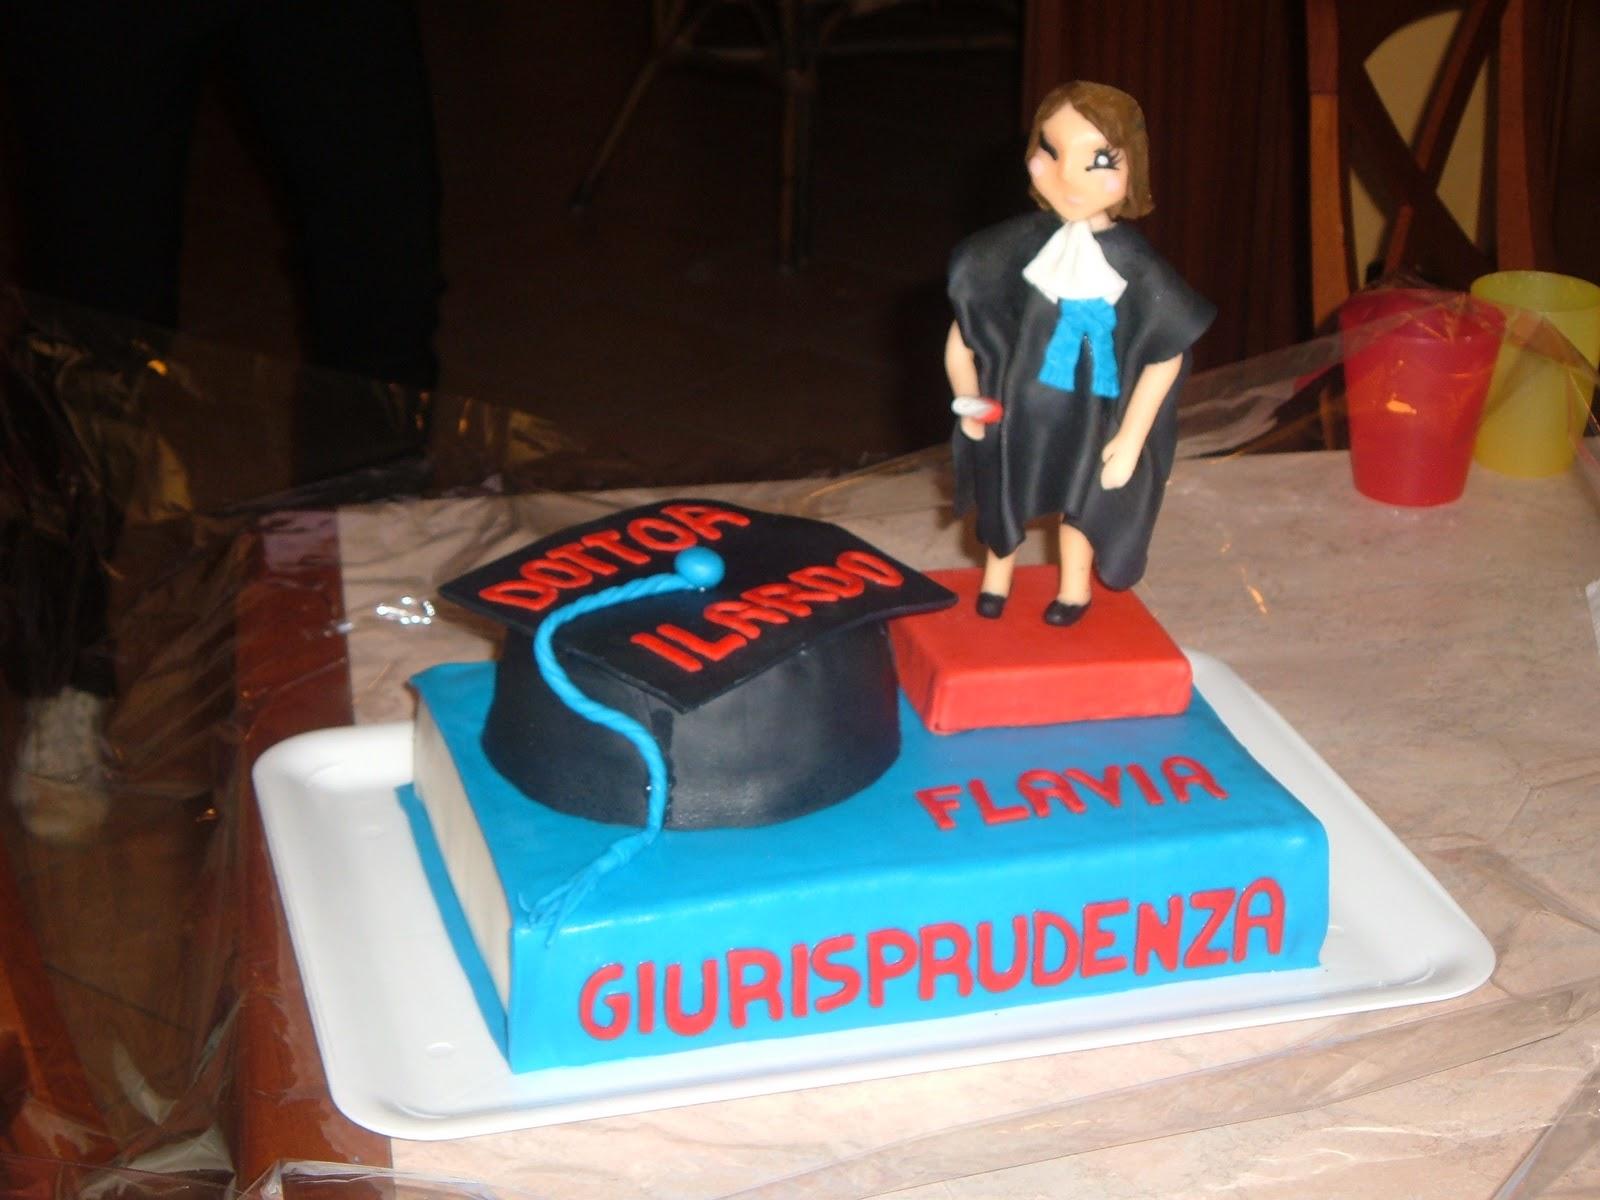 Amato Tutti Pazzi x La PdZ (Pasta di Zucchero): Torta Laurea Giurisprudenza LD95